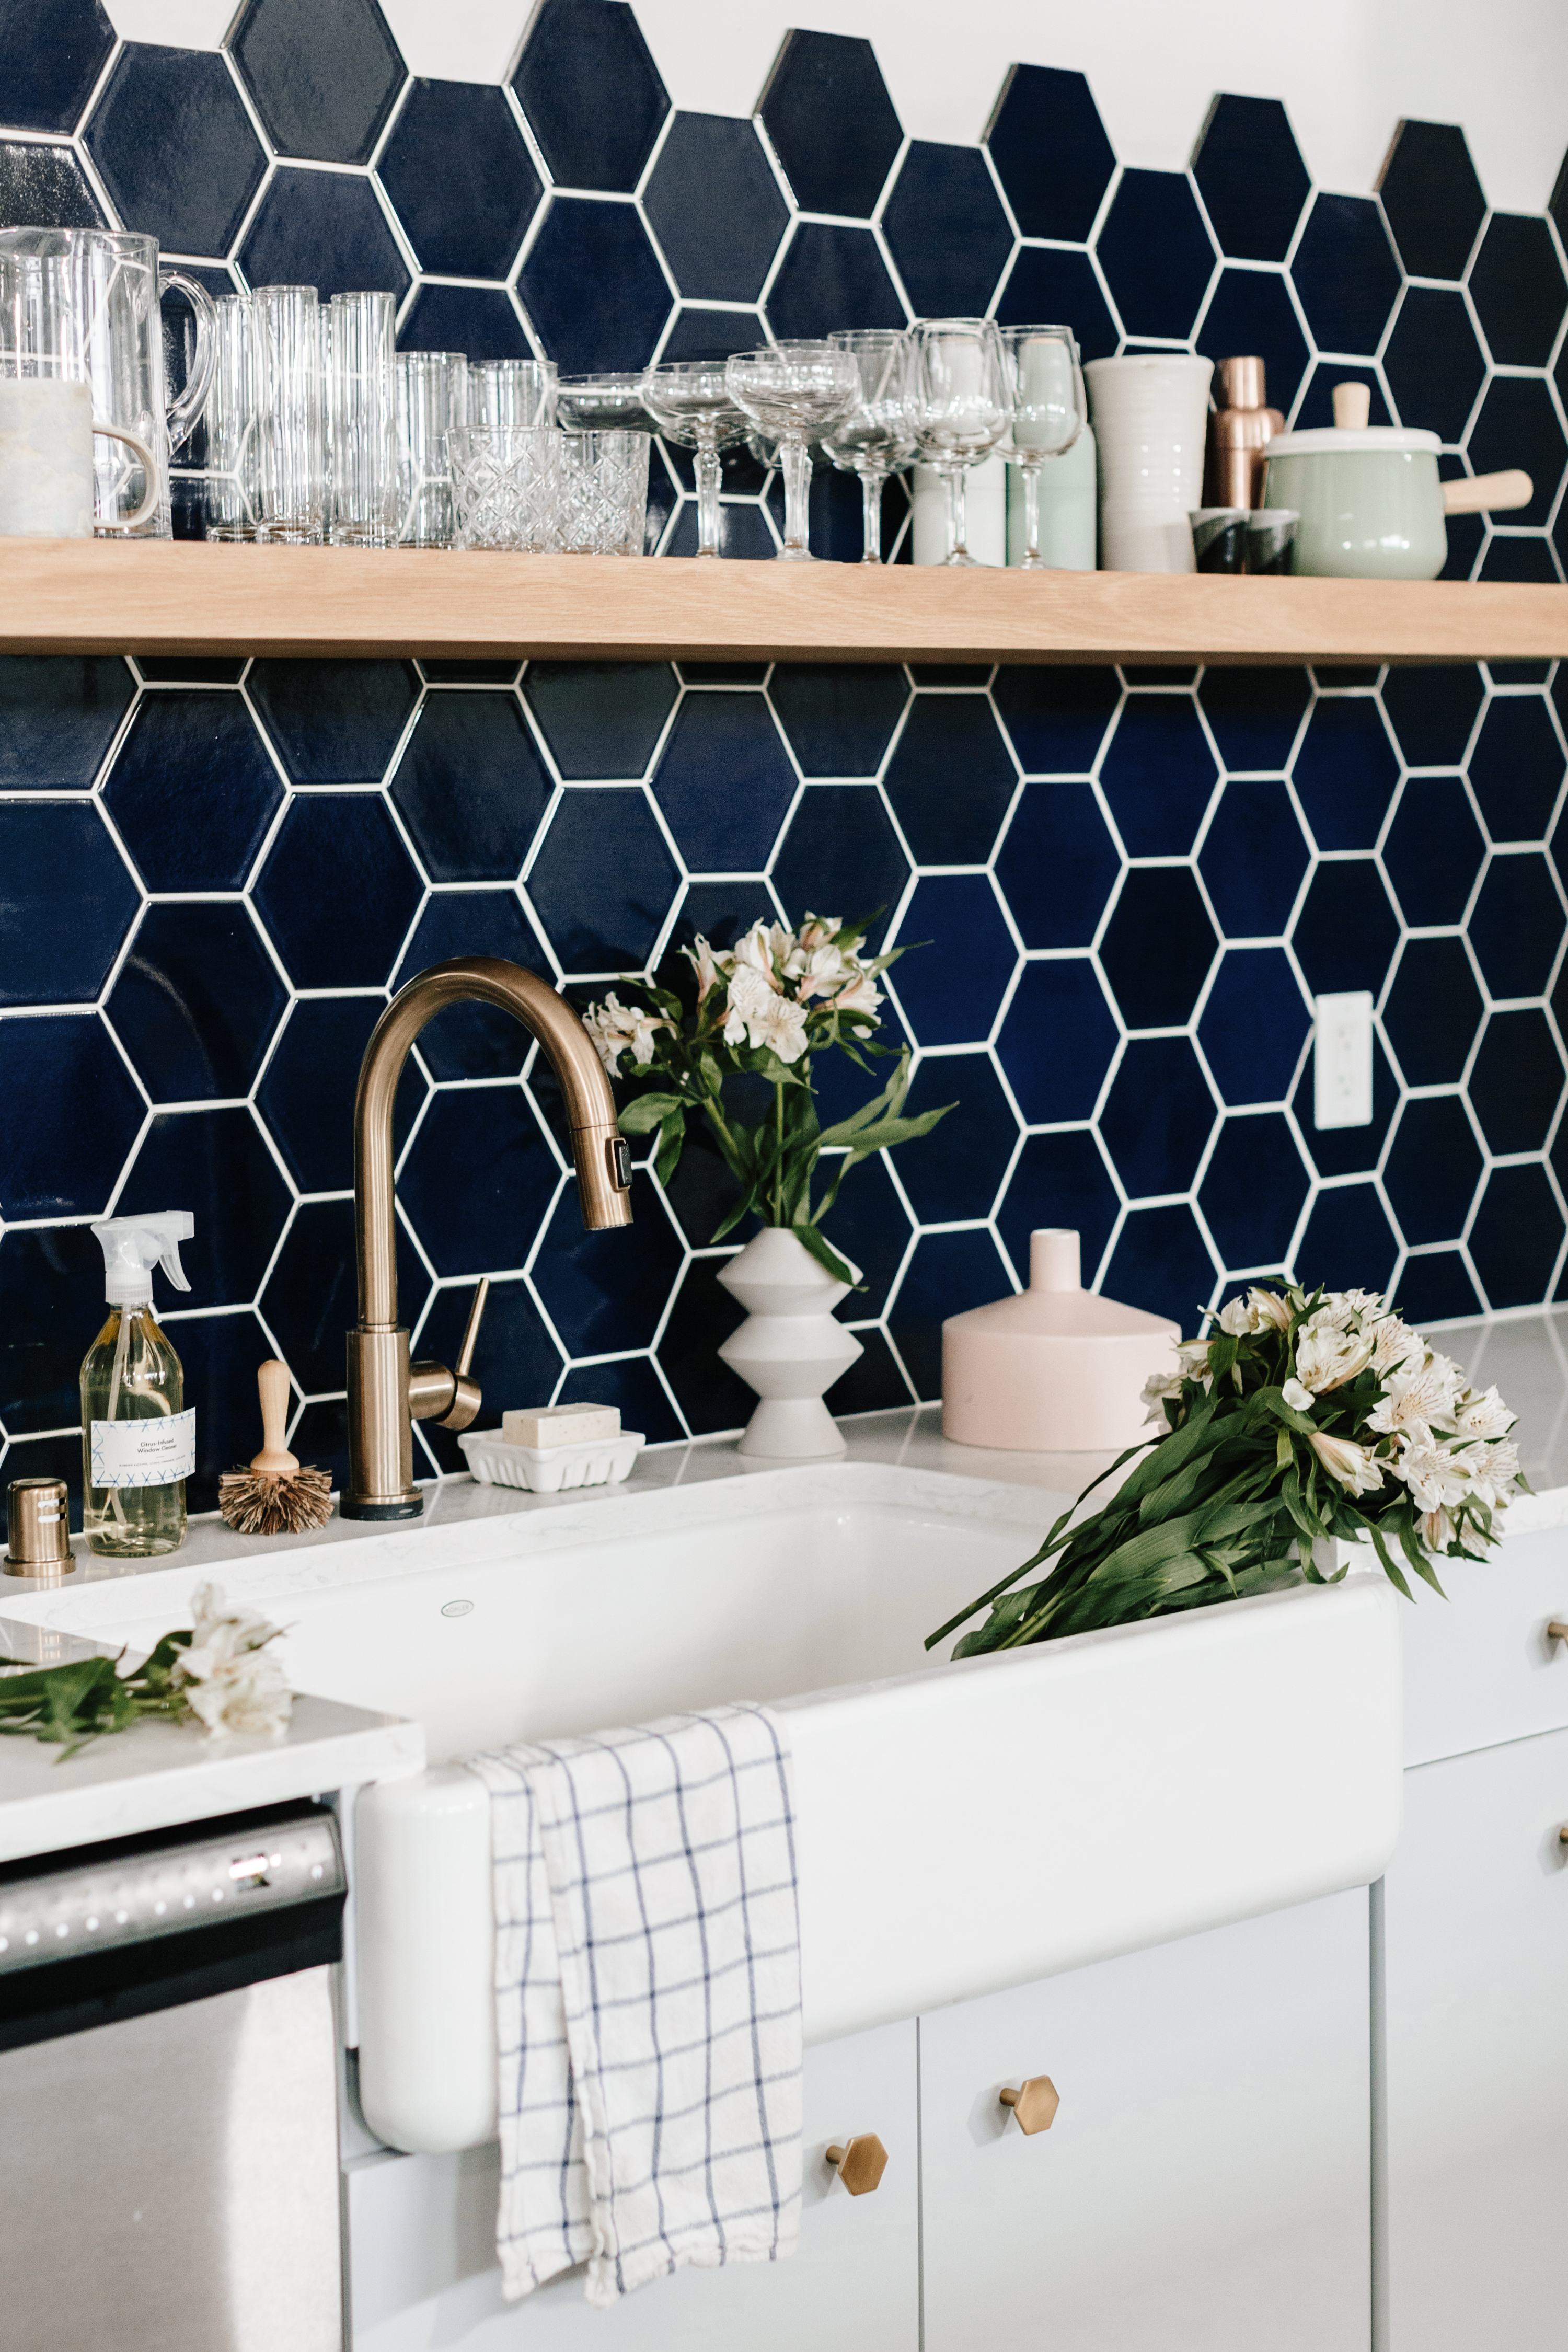 2017_Q1_image_commercial_influencer_witdelight_studio_kitchen_backsplash_tile_hexagon_6_navy_blue_edit.jpg?mtime=20180610120921#asset:266460